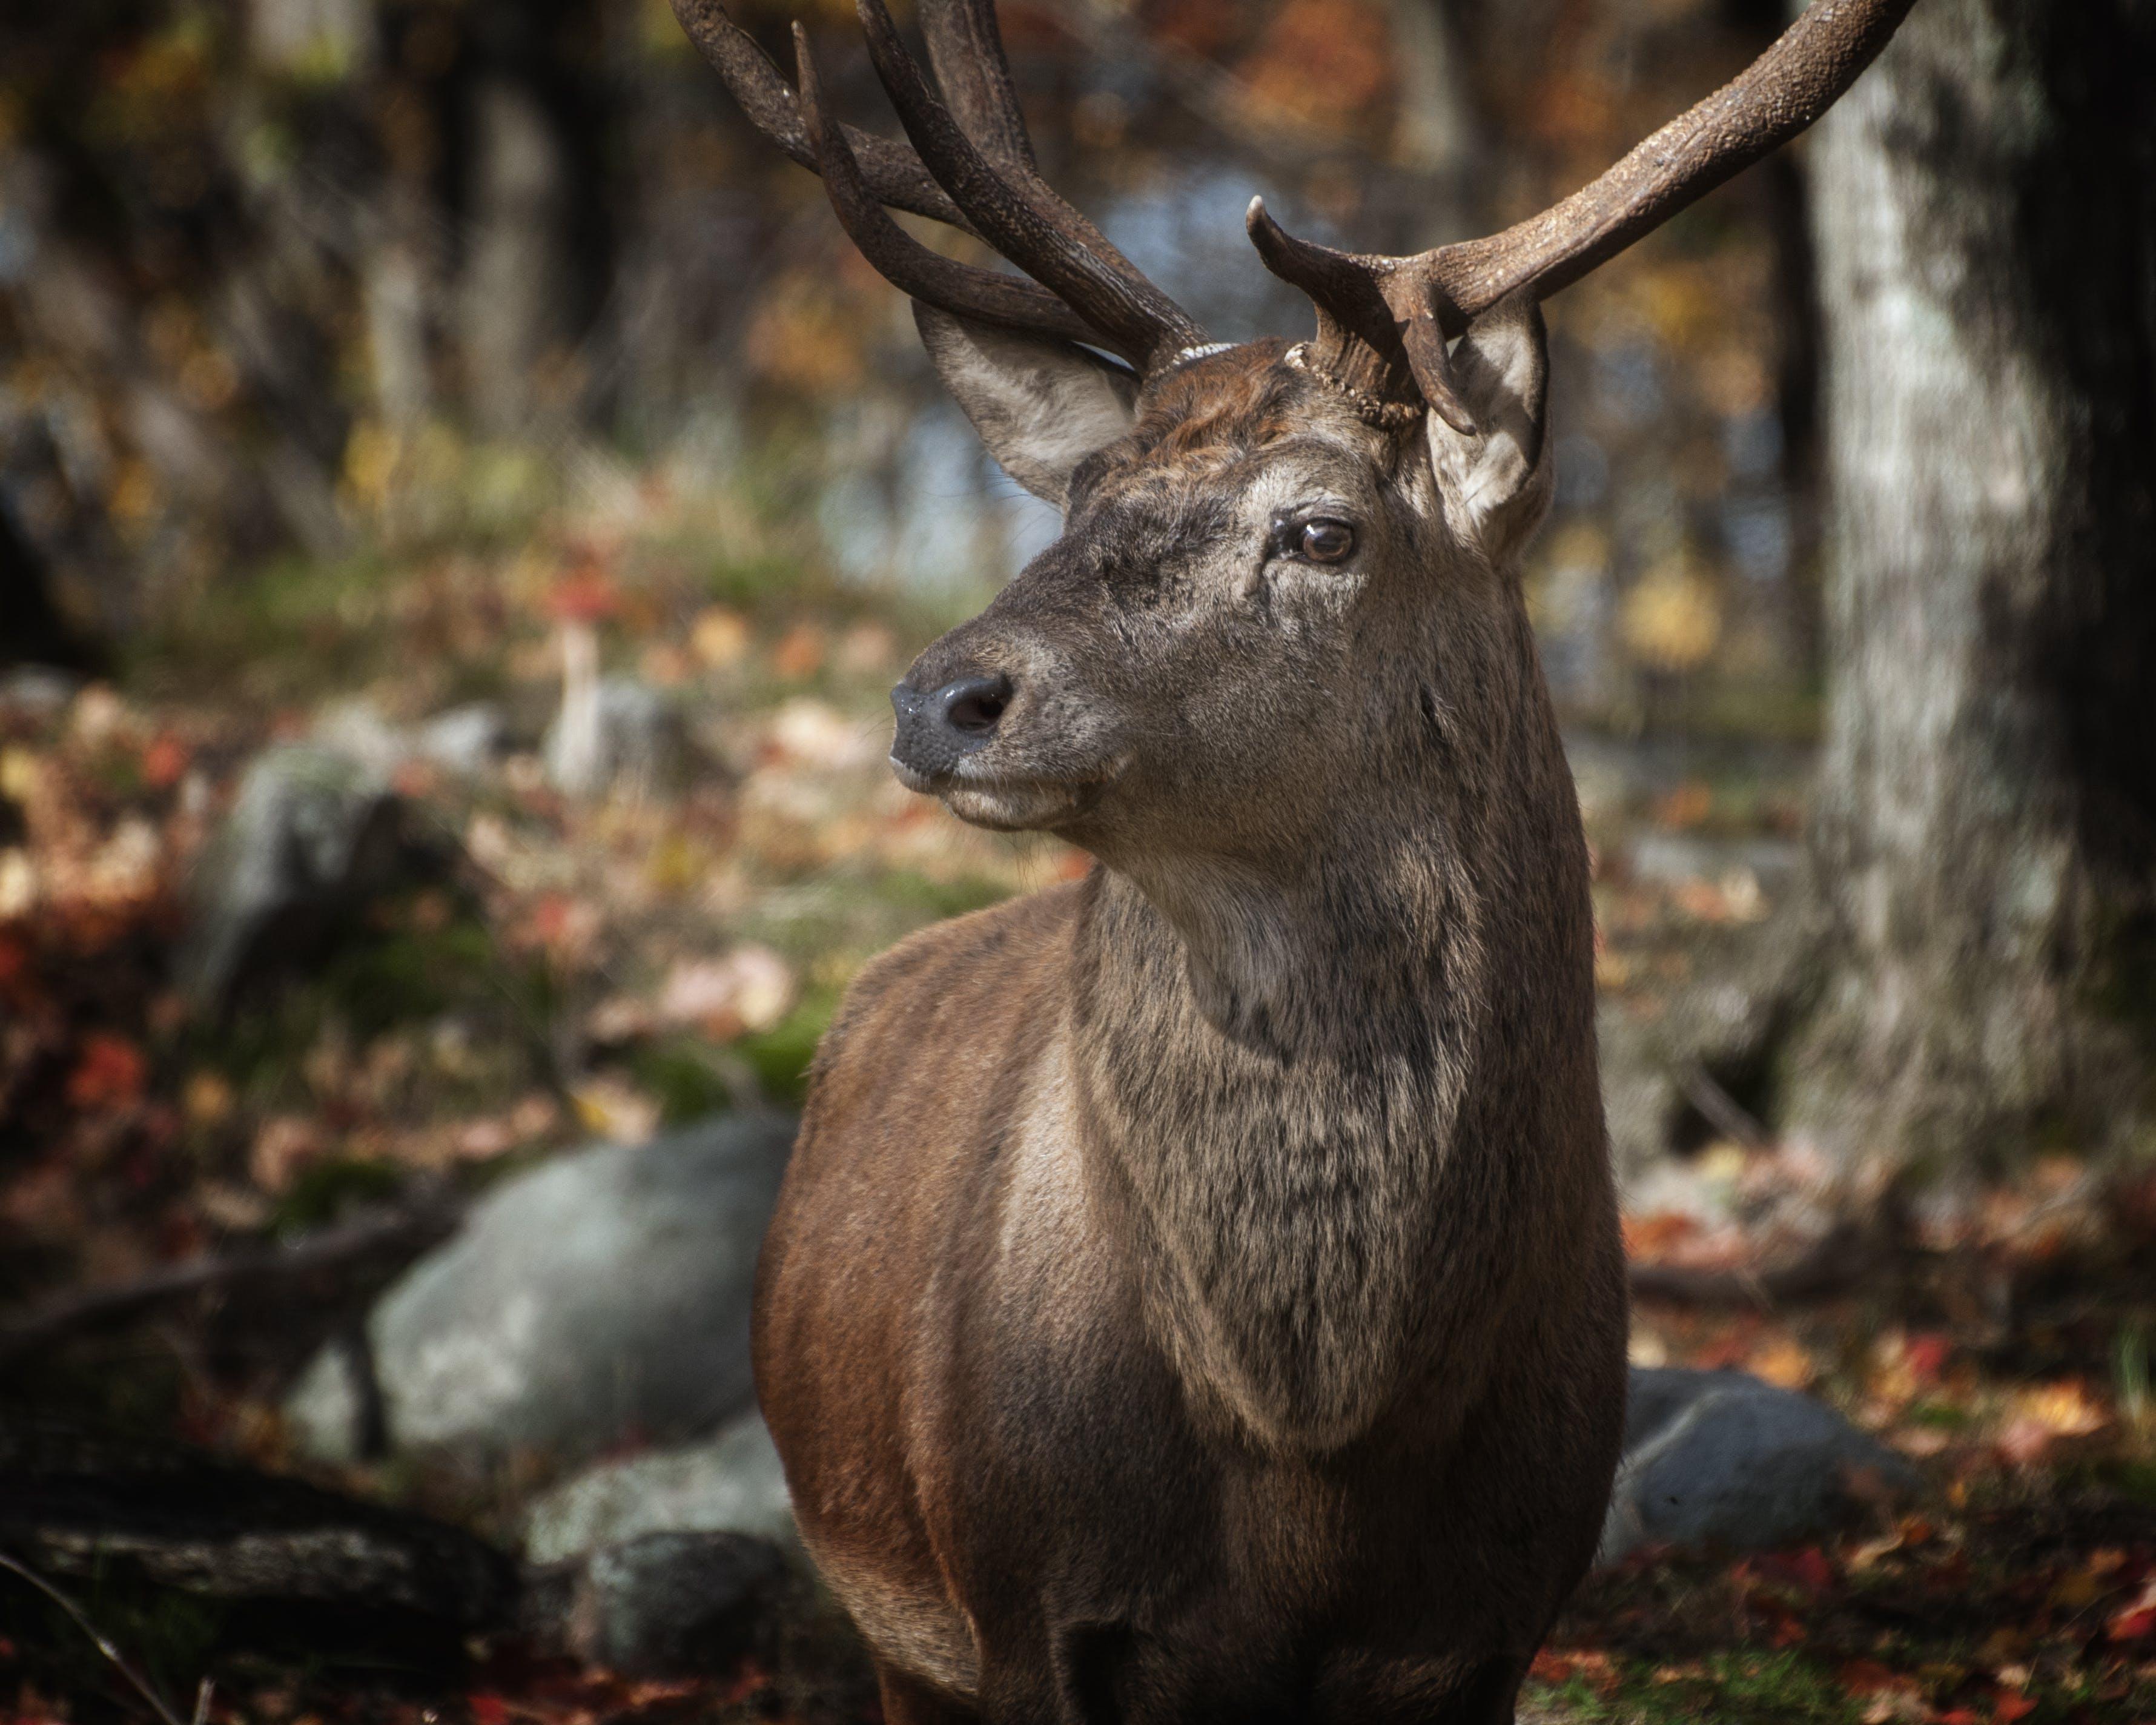 Tilt Shift Lens Photography of Deer